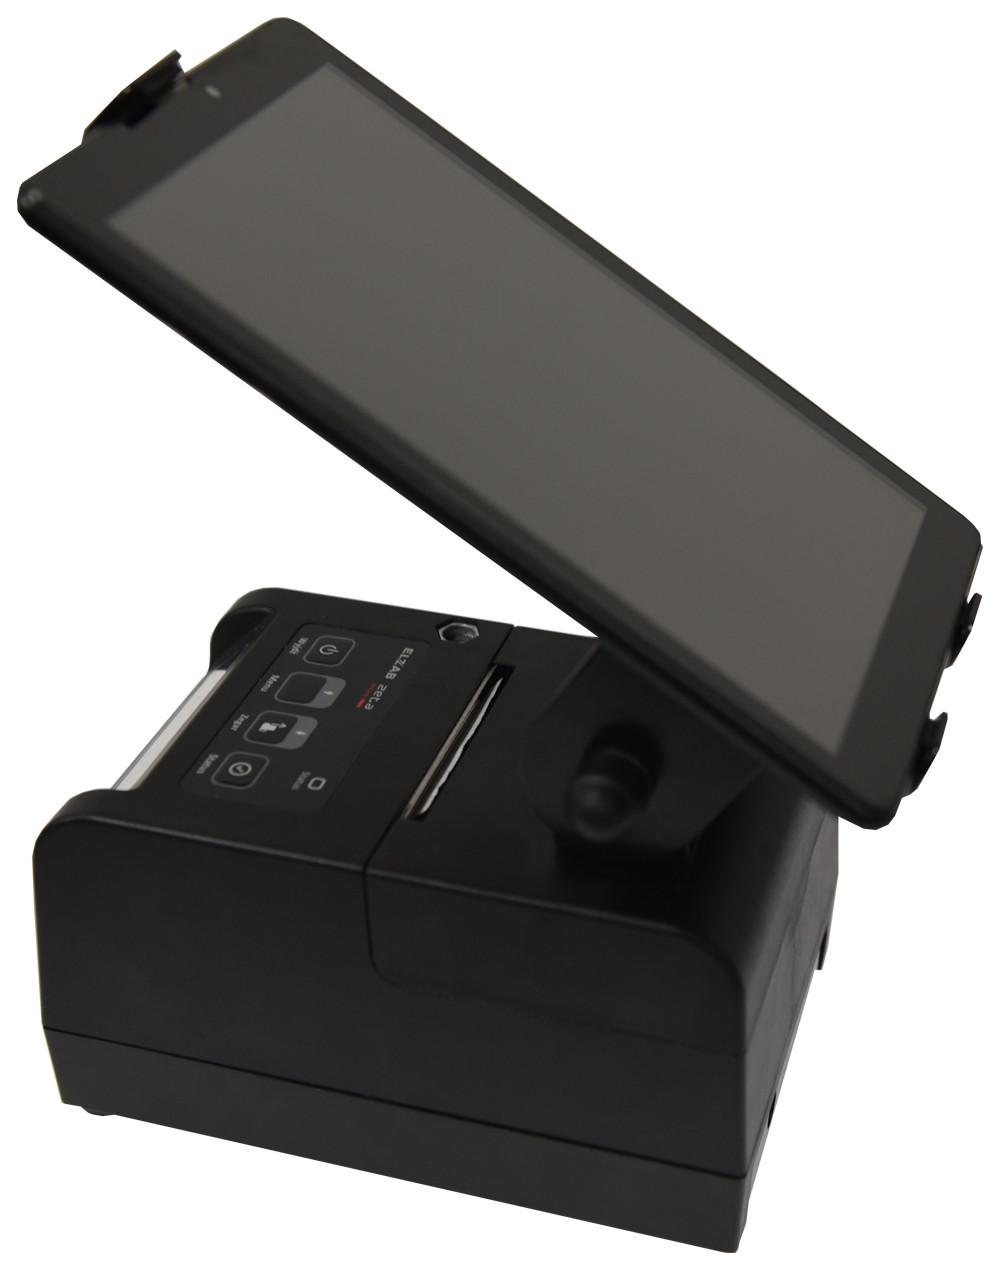 Uchwyt do tabletu lub smartfona dedykowany dla drukarki ELZAB Zeta